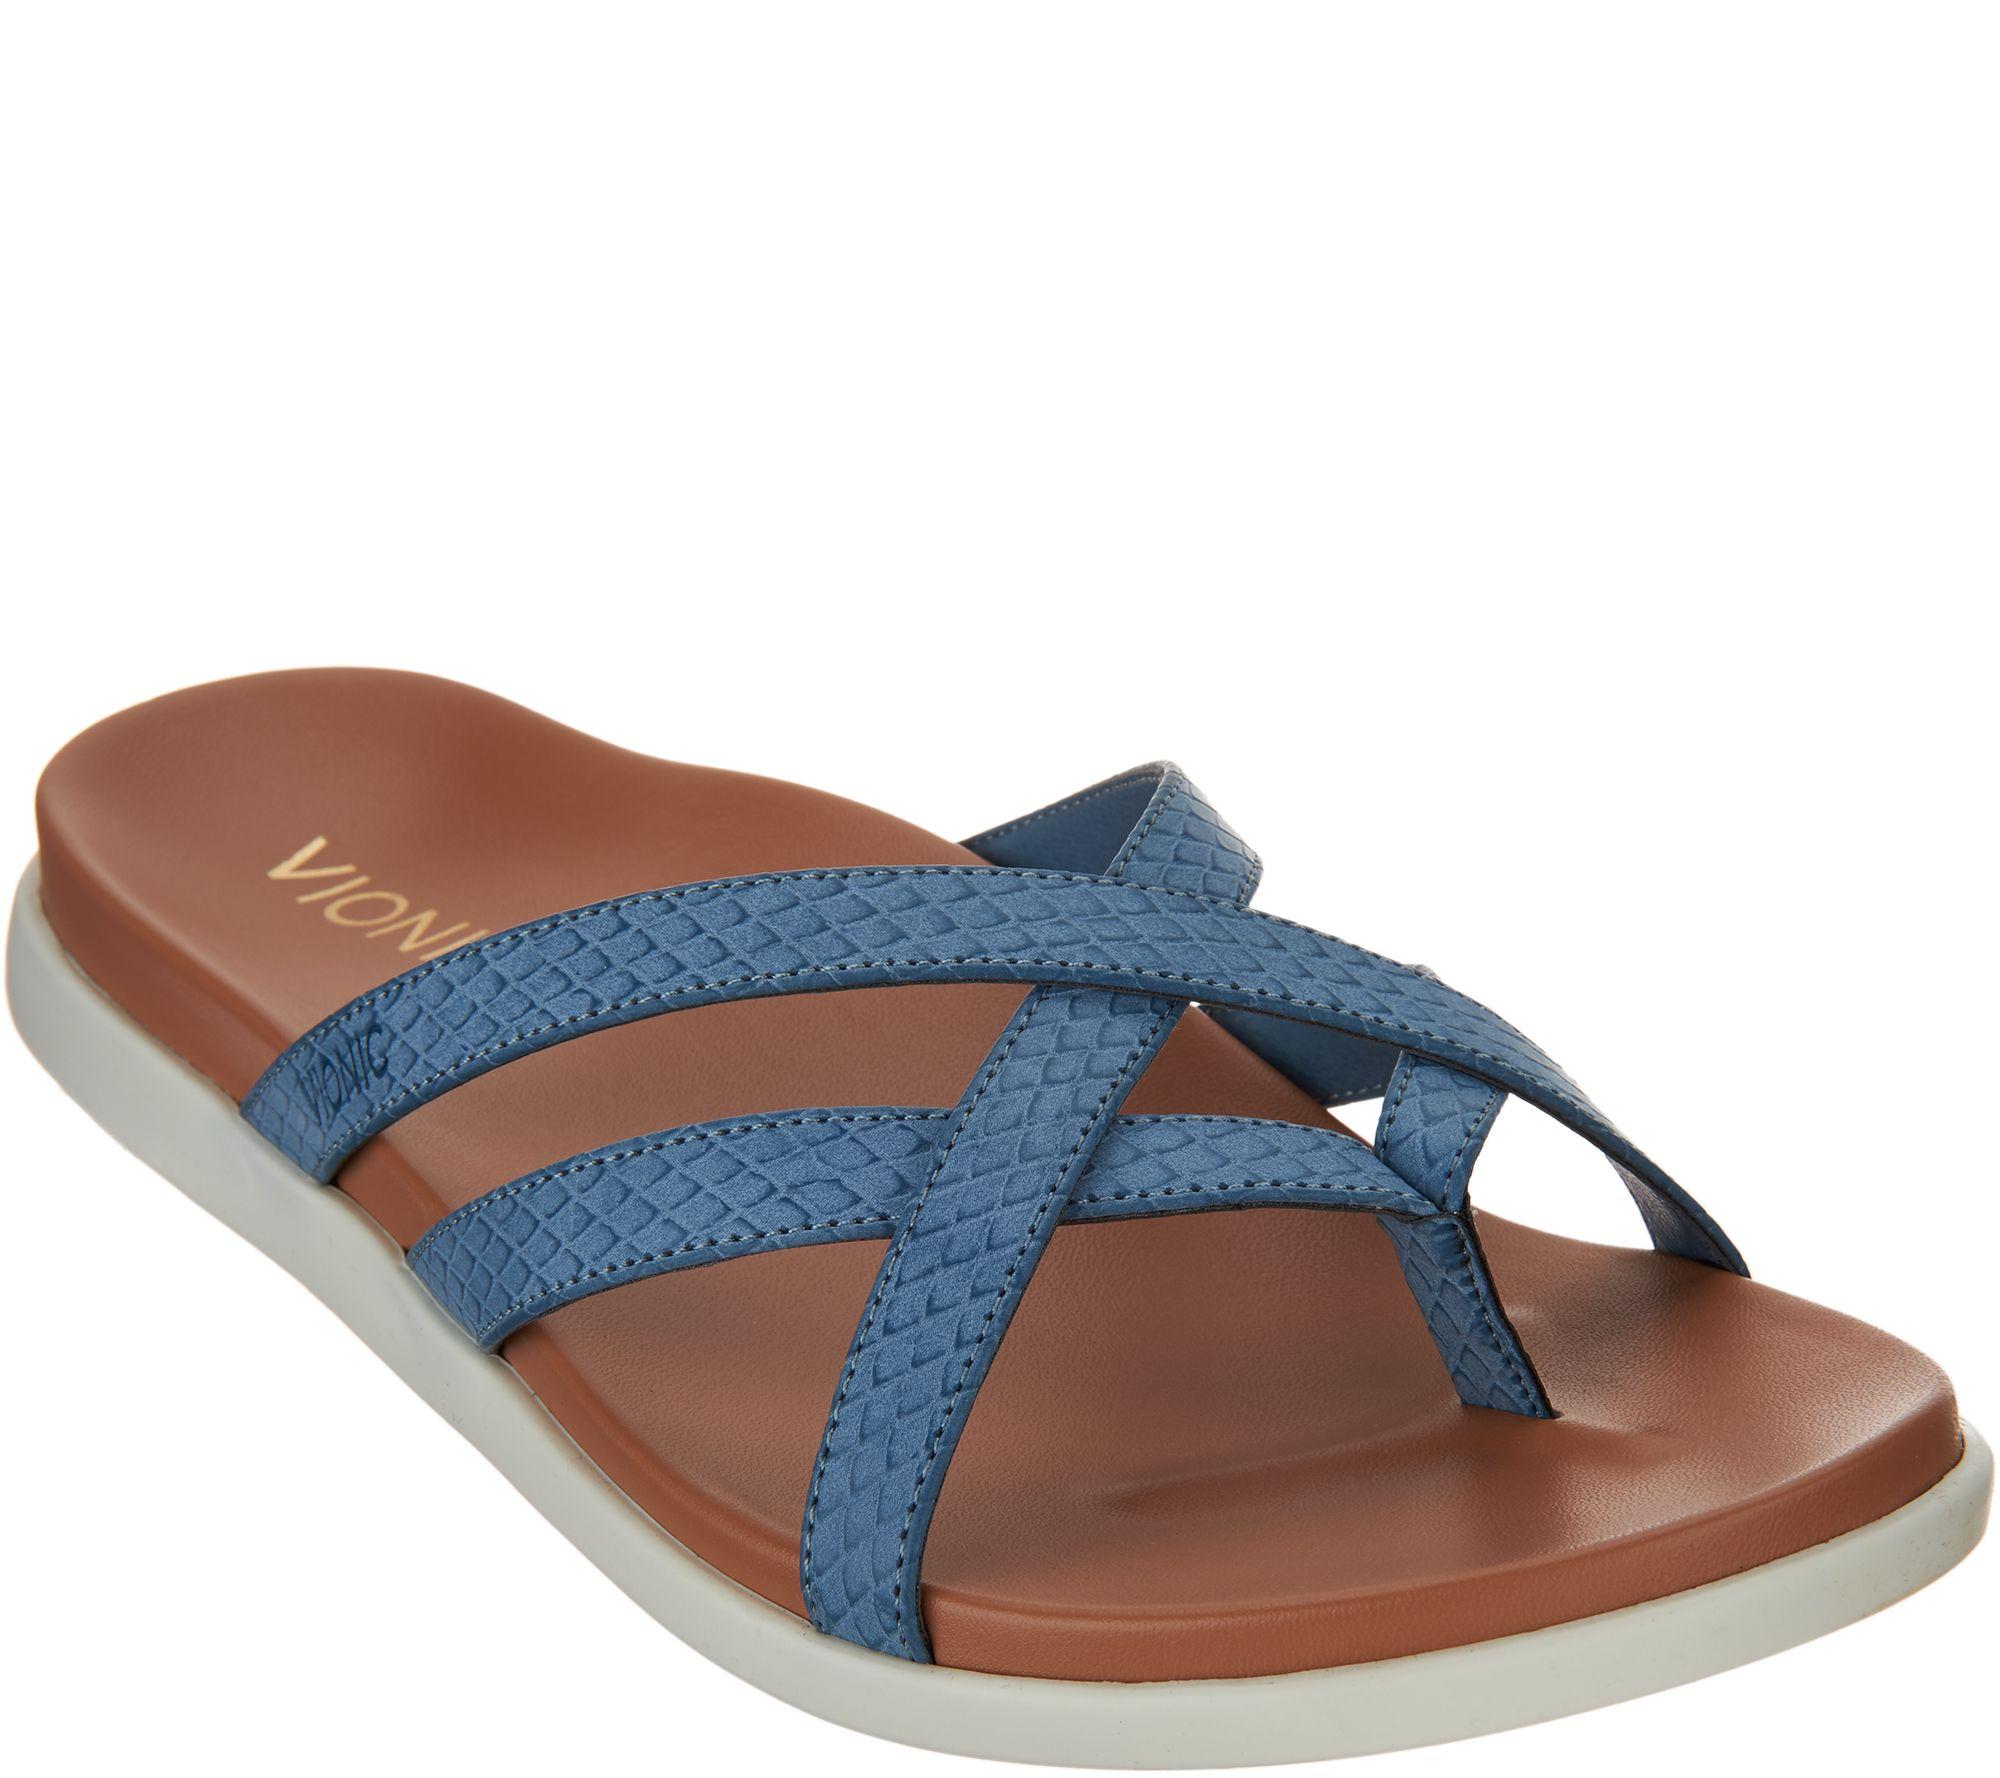 ea49d48bc9a2 Vionic Multi-Strap Sandals - Daisy - Page 1 — QVC.com